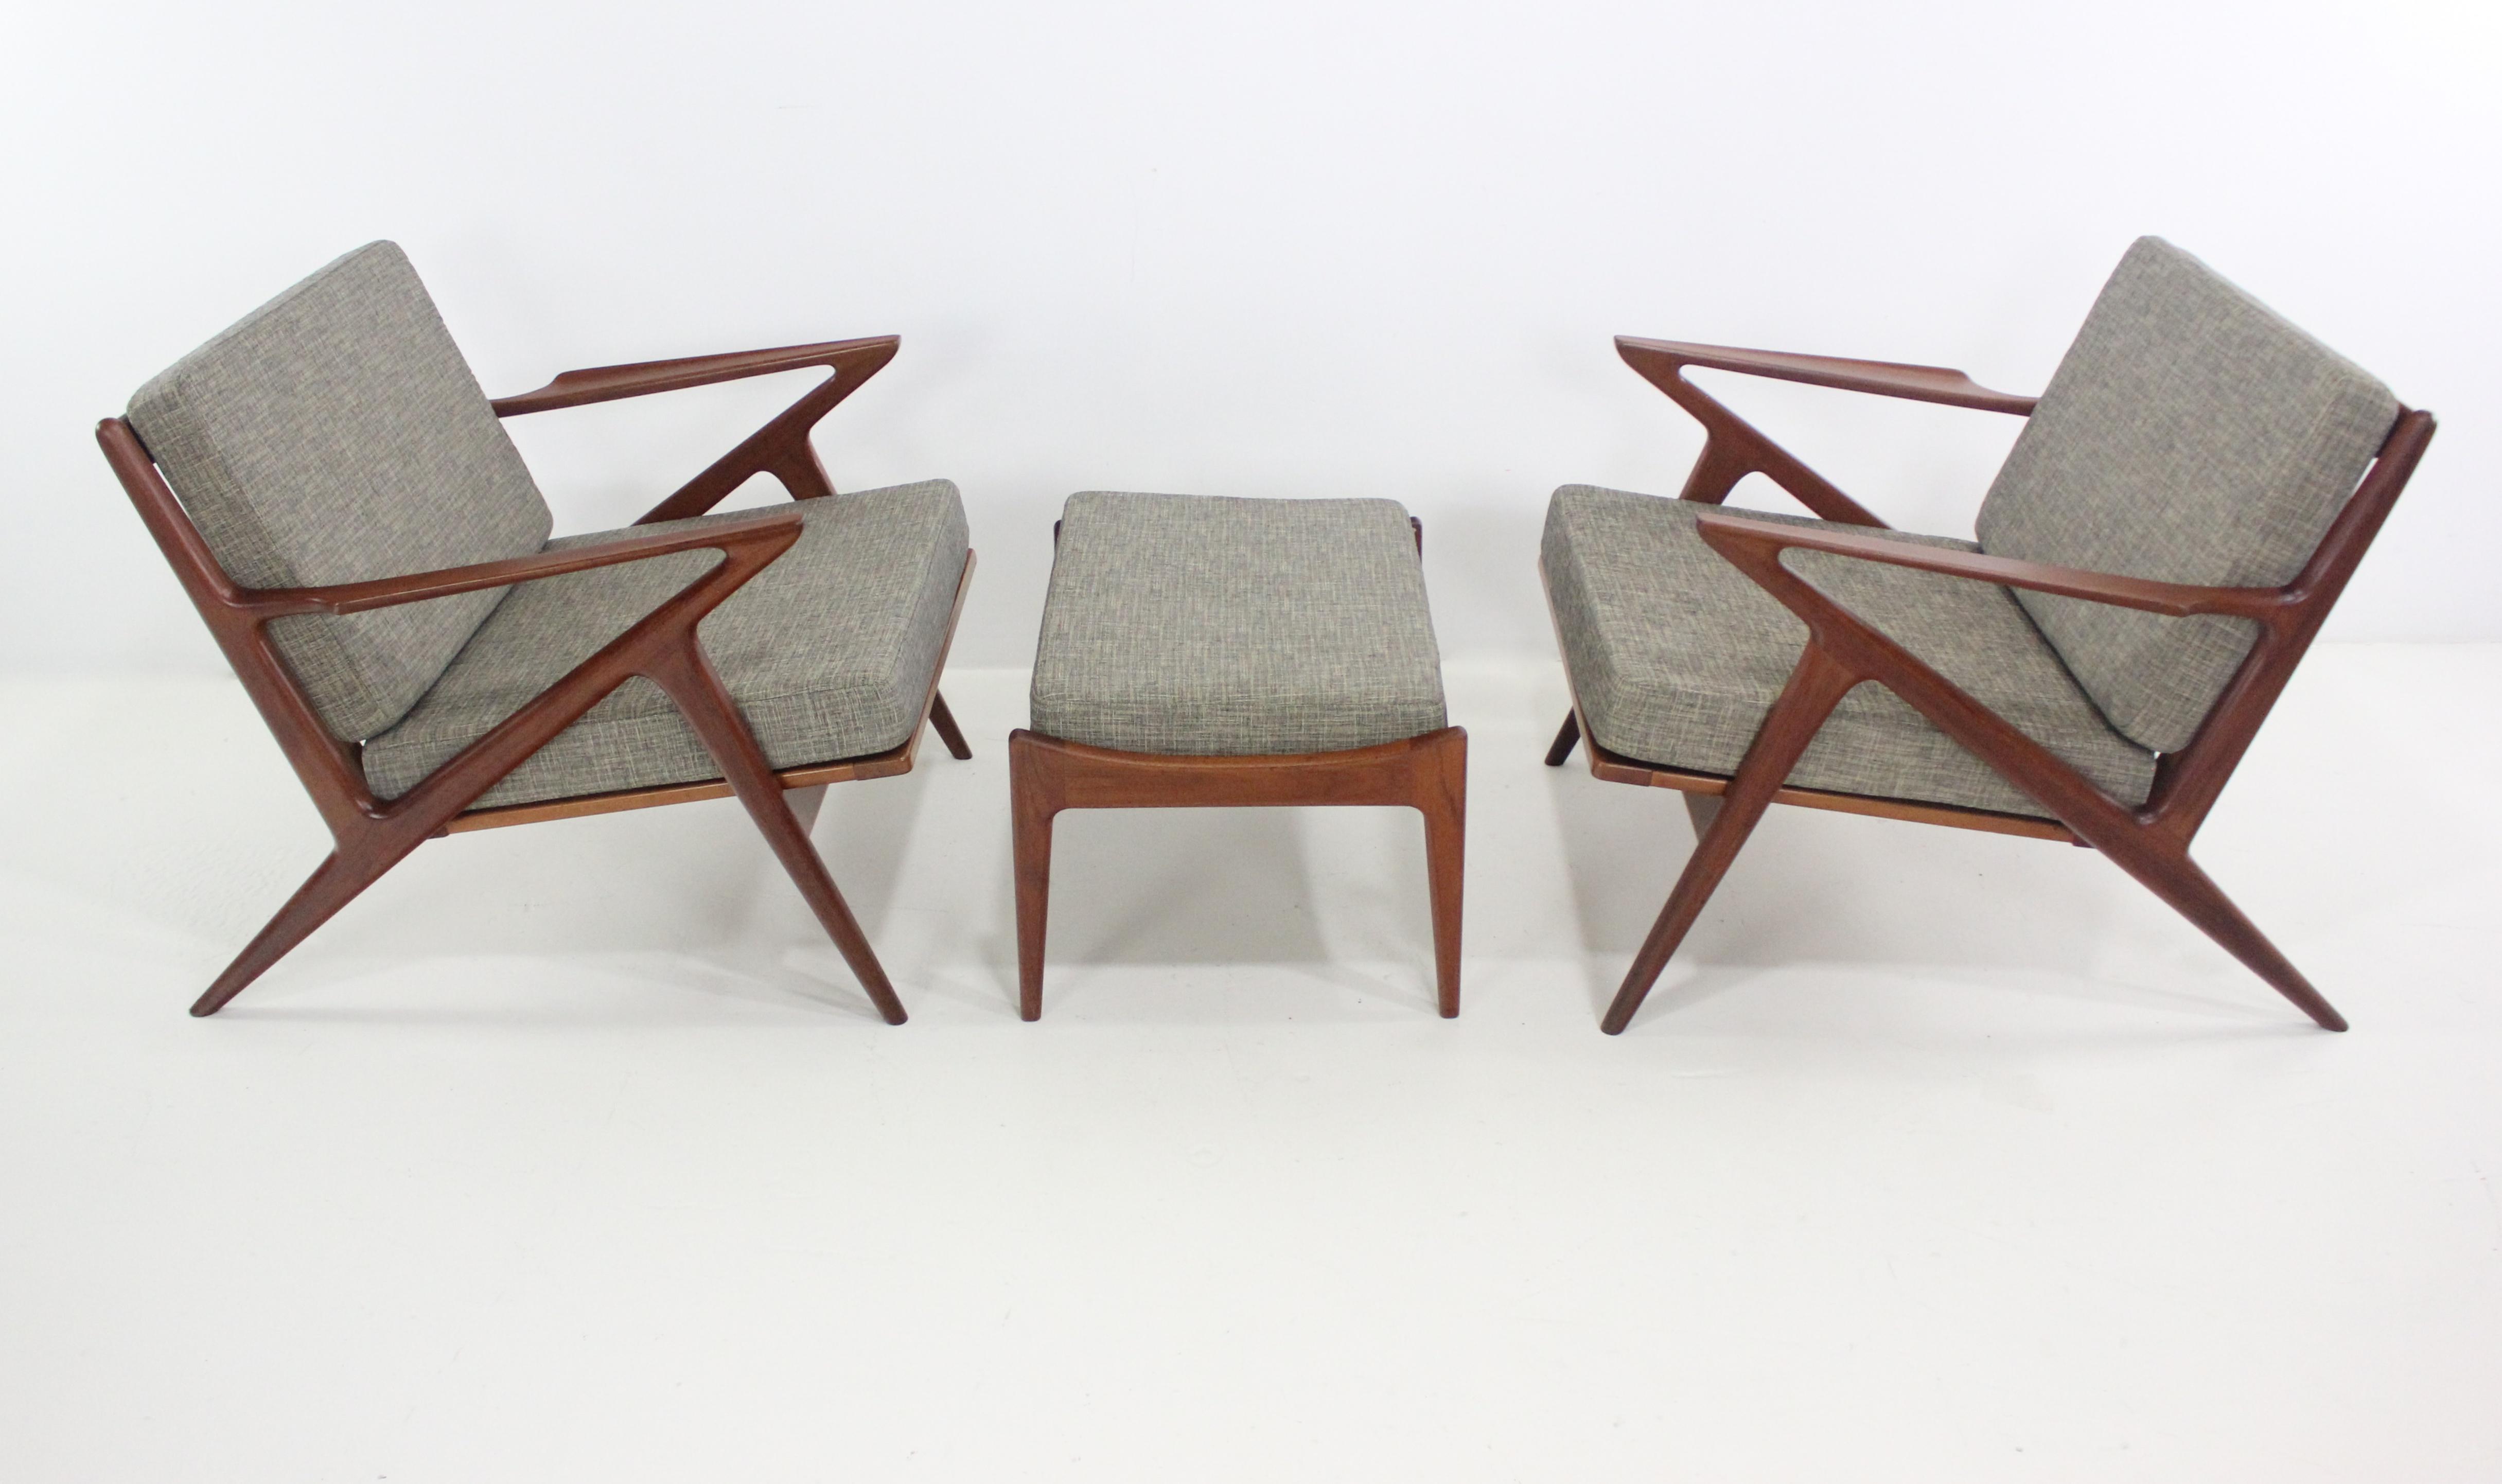 Danish Modern Z Chairs Ottoman Designed By Poul Jensen